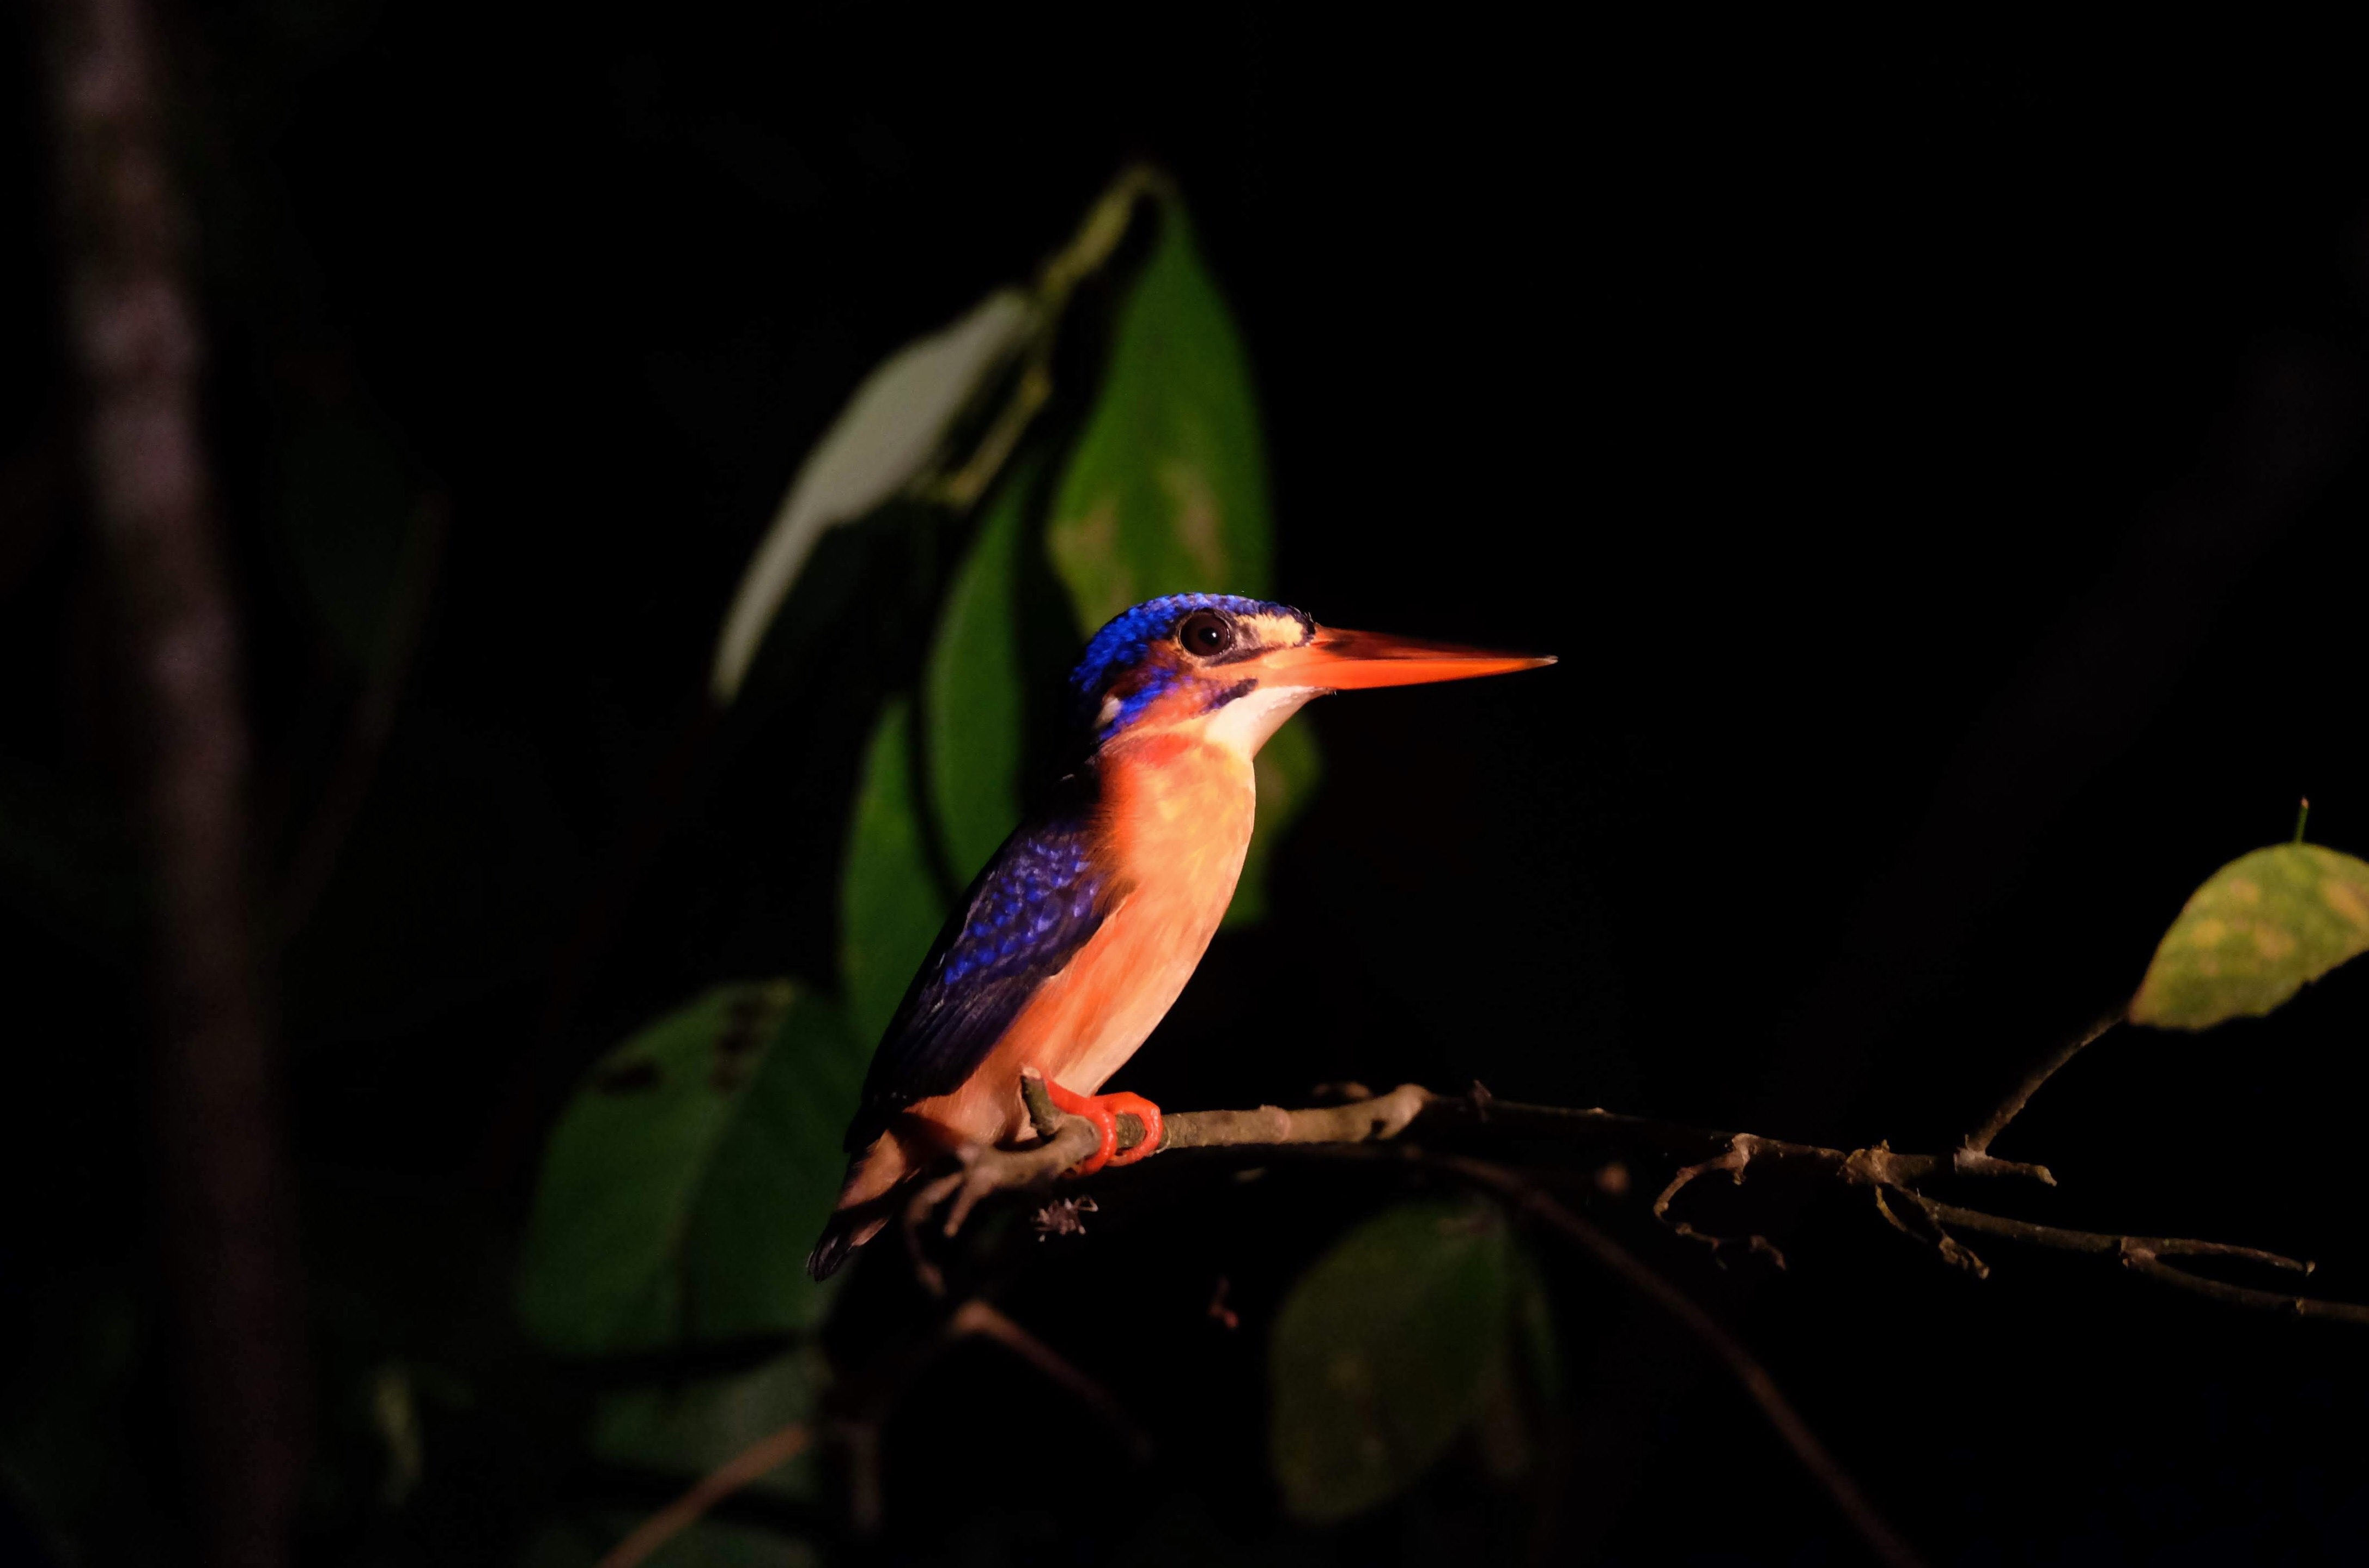 Blue-eared kingfisher, Kinabatangan River, Borneo